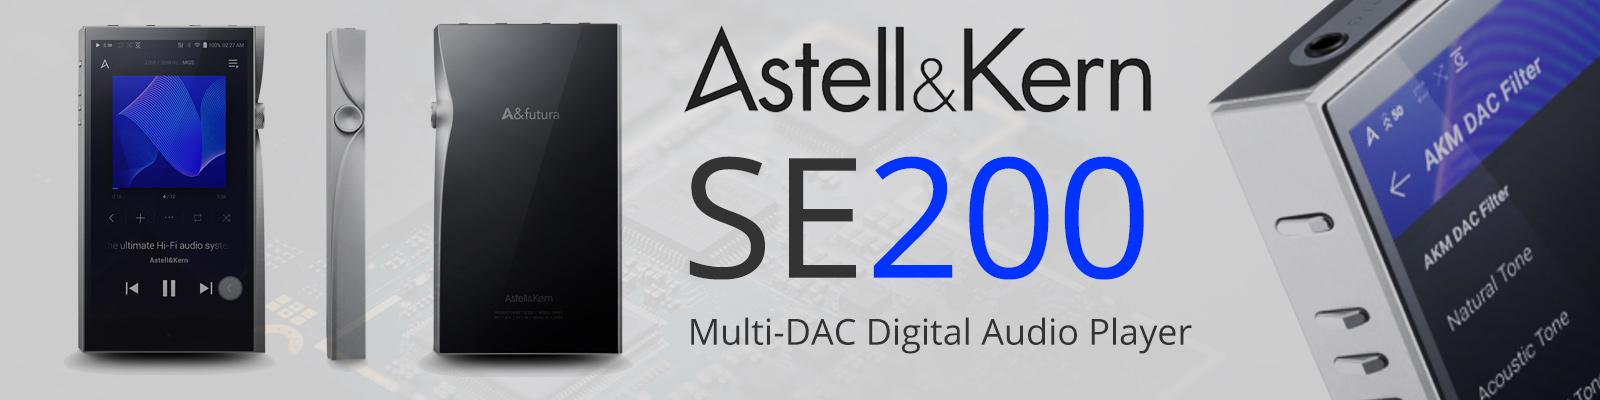 Astell & Kern SE200 - The World's First Multi-DAC Digital Audio Player | Audio Sanctuary